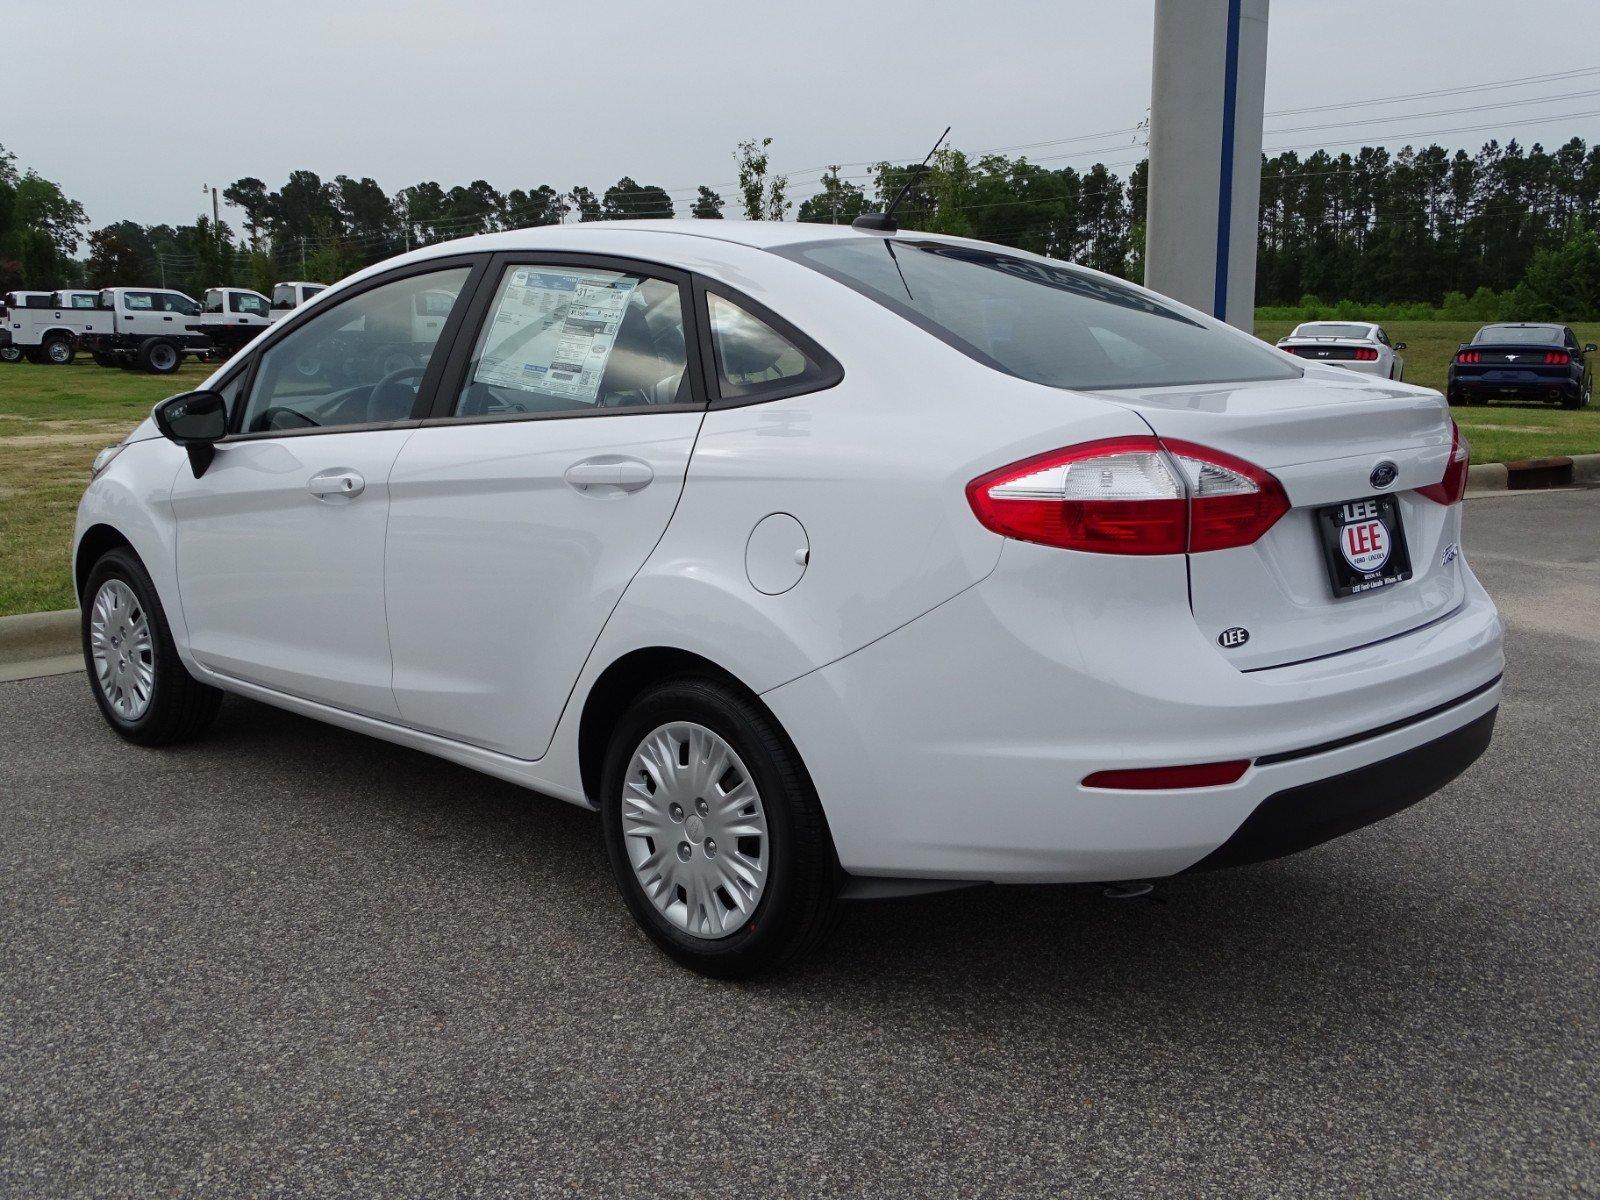 New 2018 Ford Fiesta White Wilson Nc 3fadp4aj2jm131639